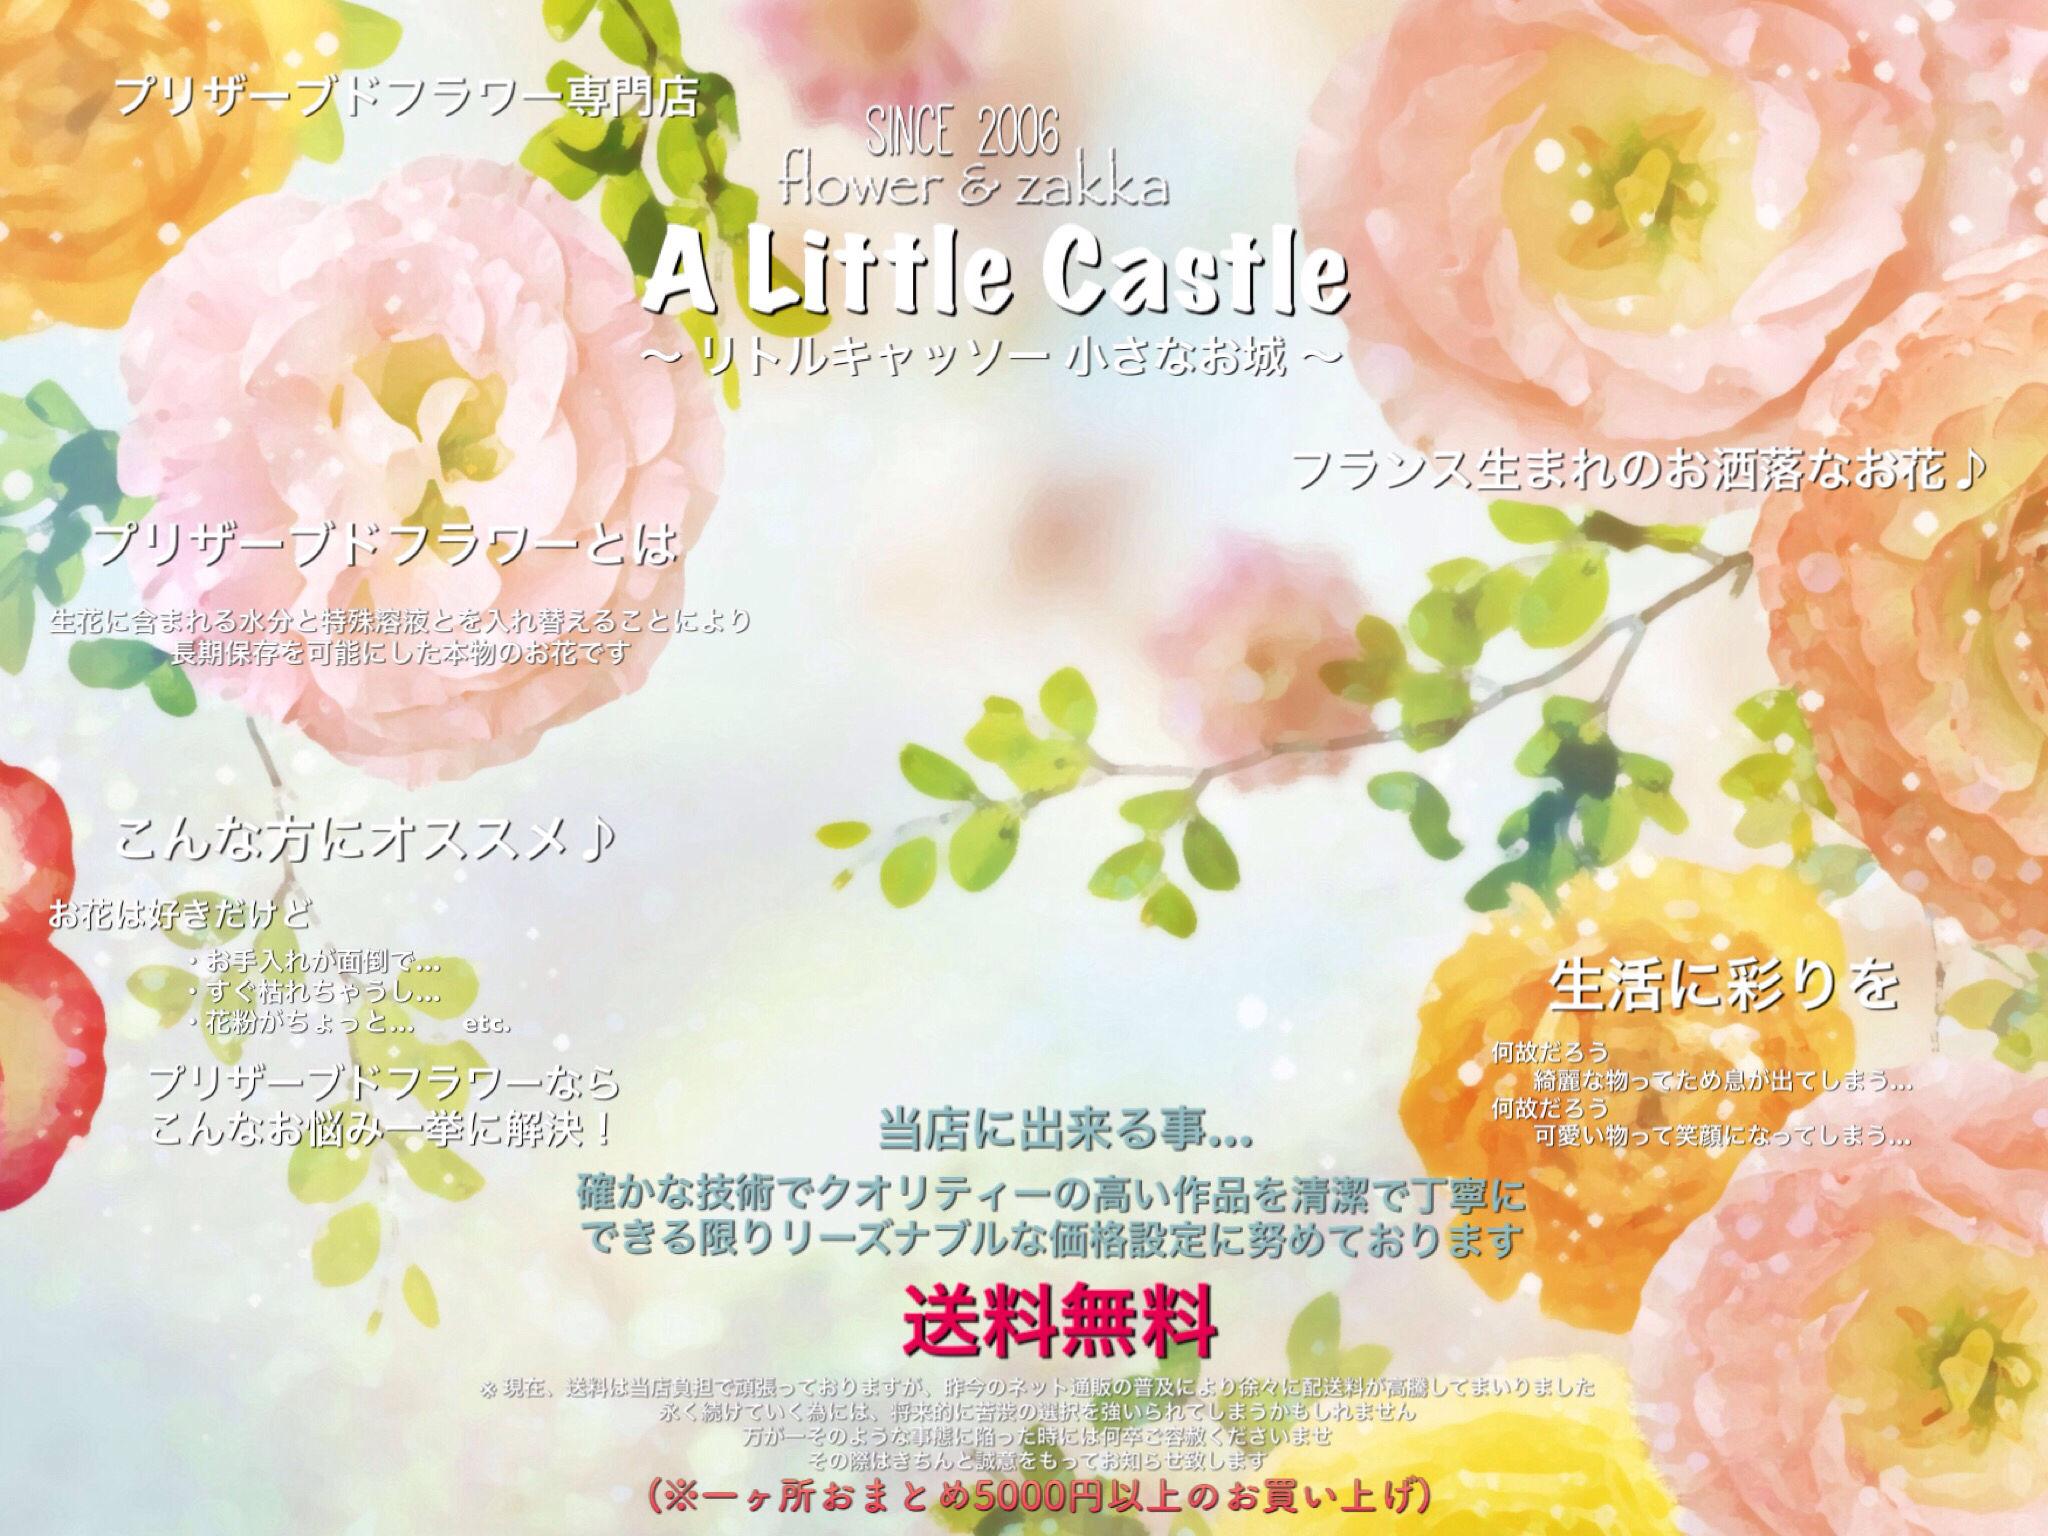 A Little Castle 〜リトルキャッソー小さなお城〜